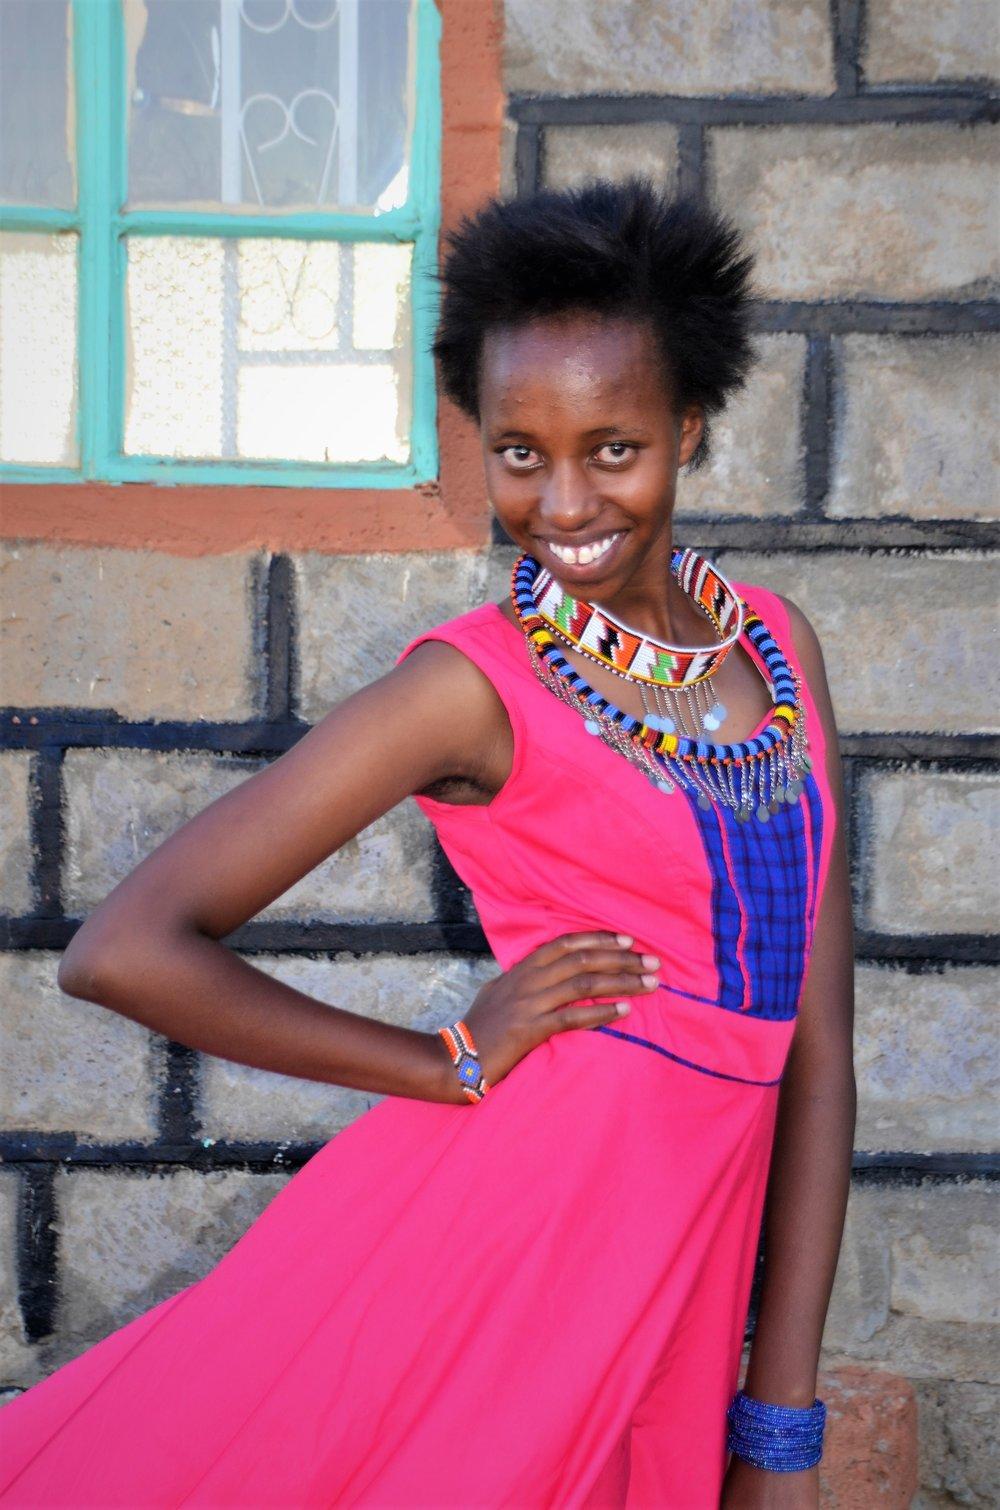 Student-Sponsorship_Kenya_Immaculate .JPG